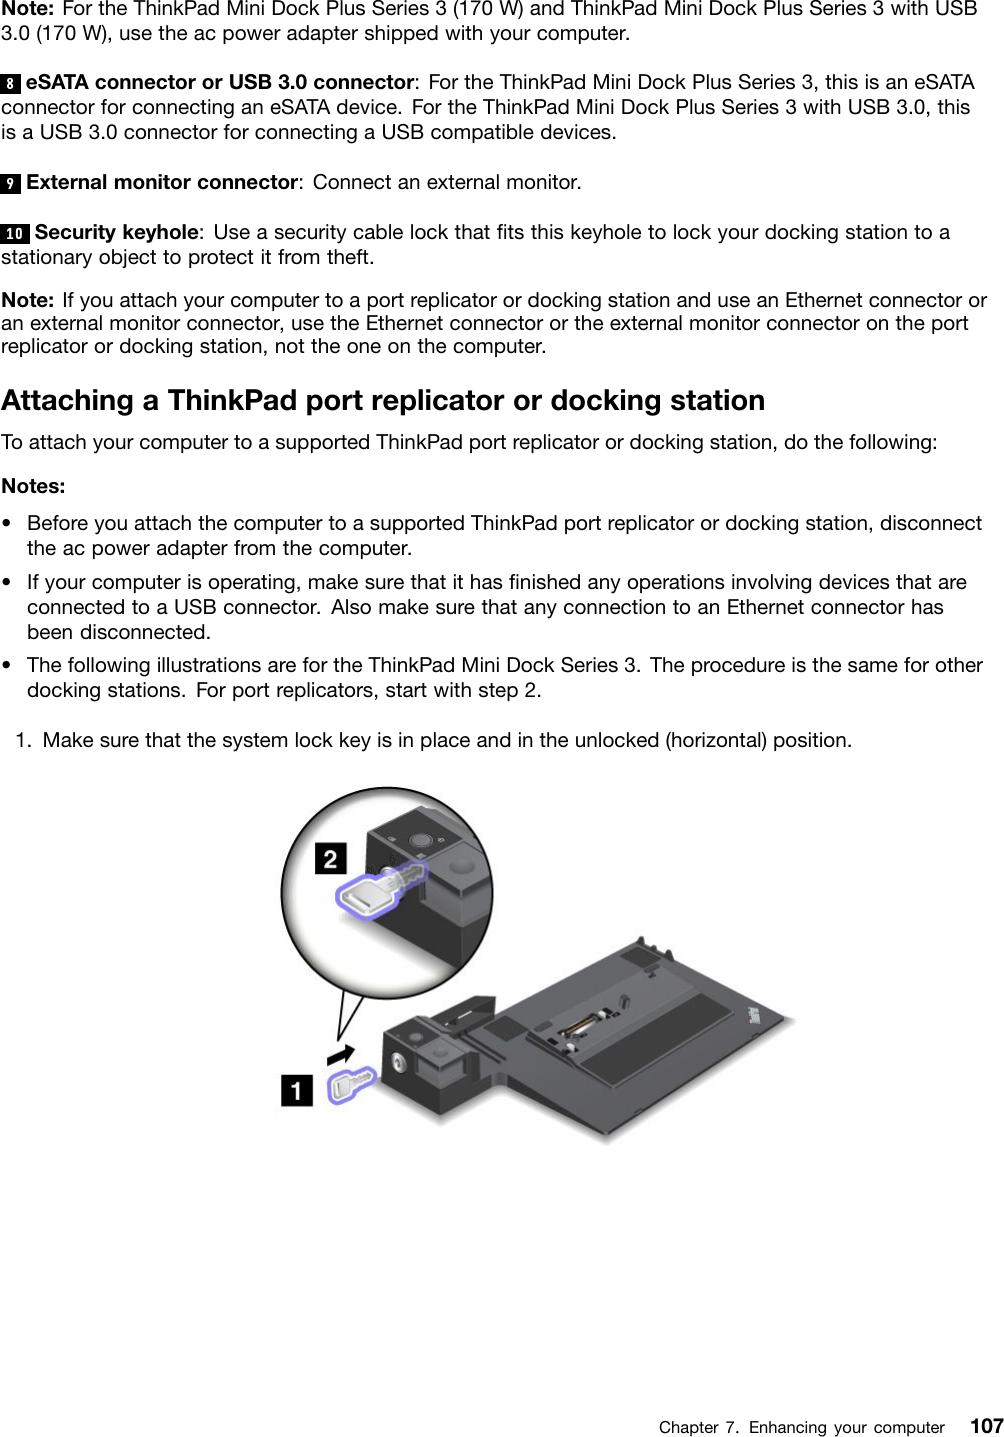 Lenovo Thinkpad External Monitor Not Working